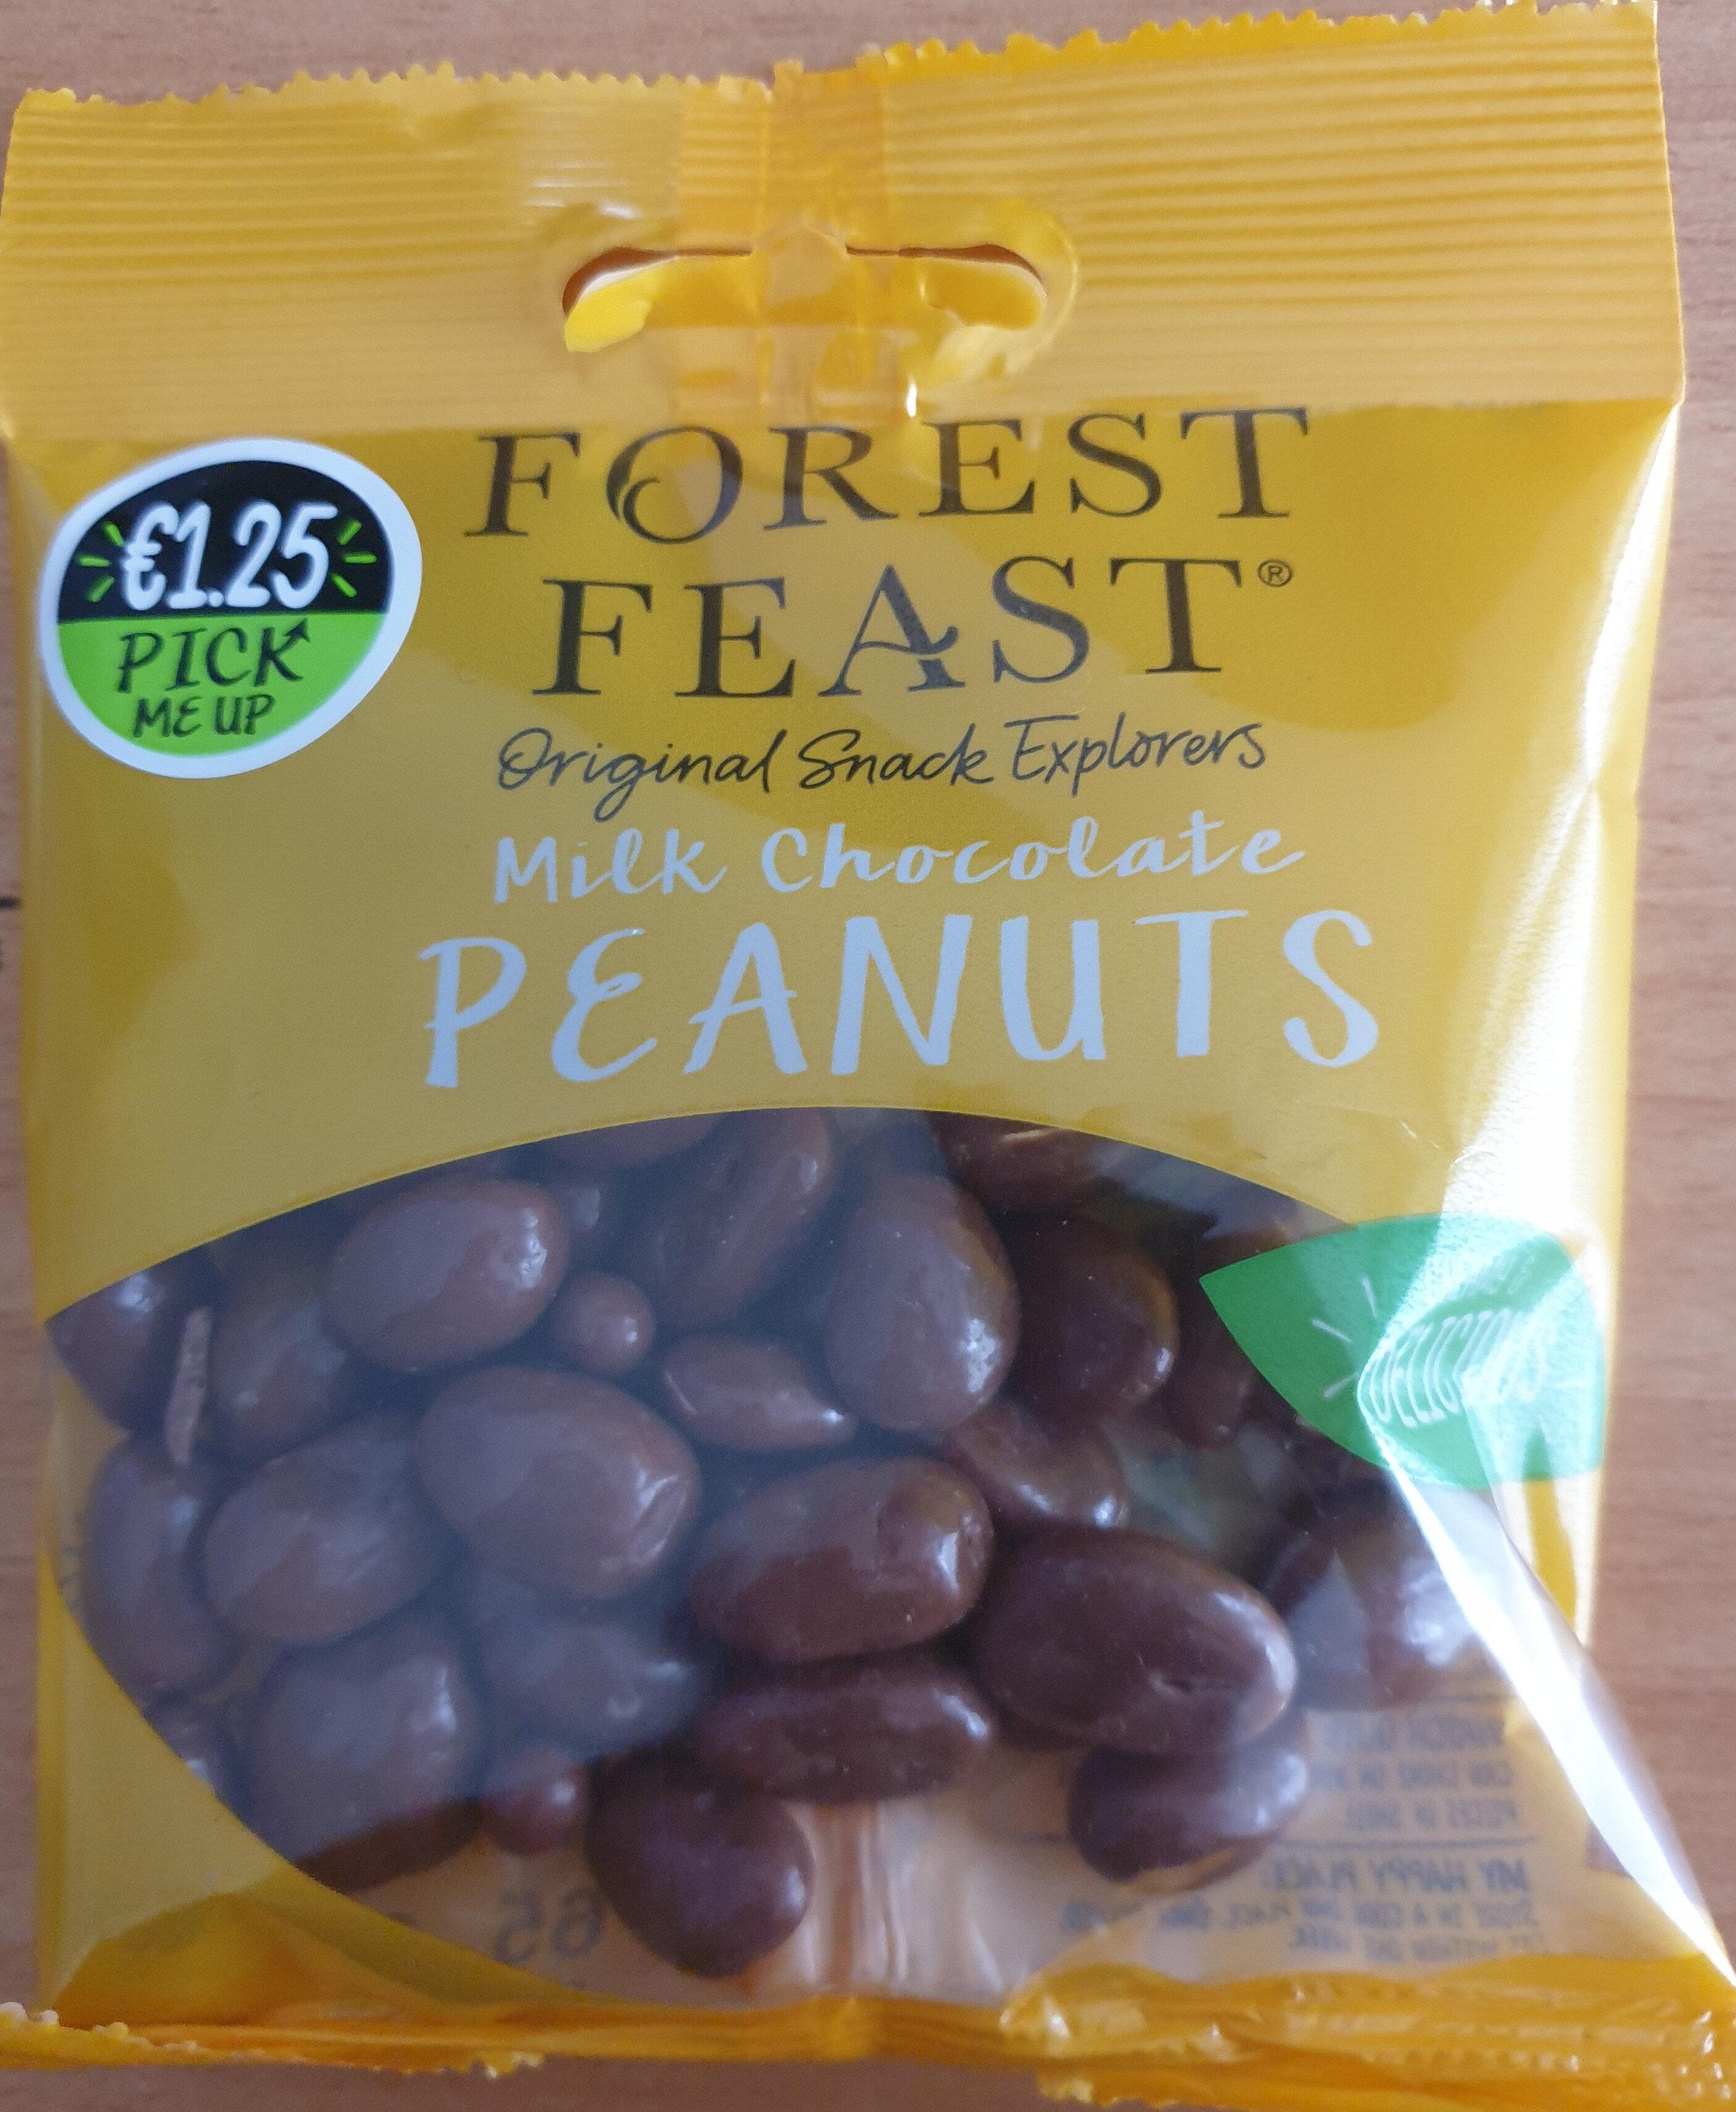 Milk Chocolate Peanuts - Produit - en